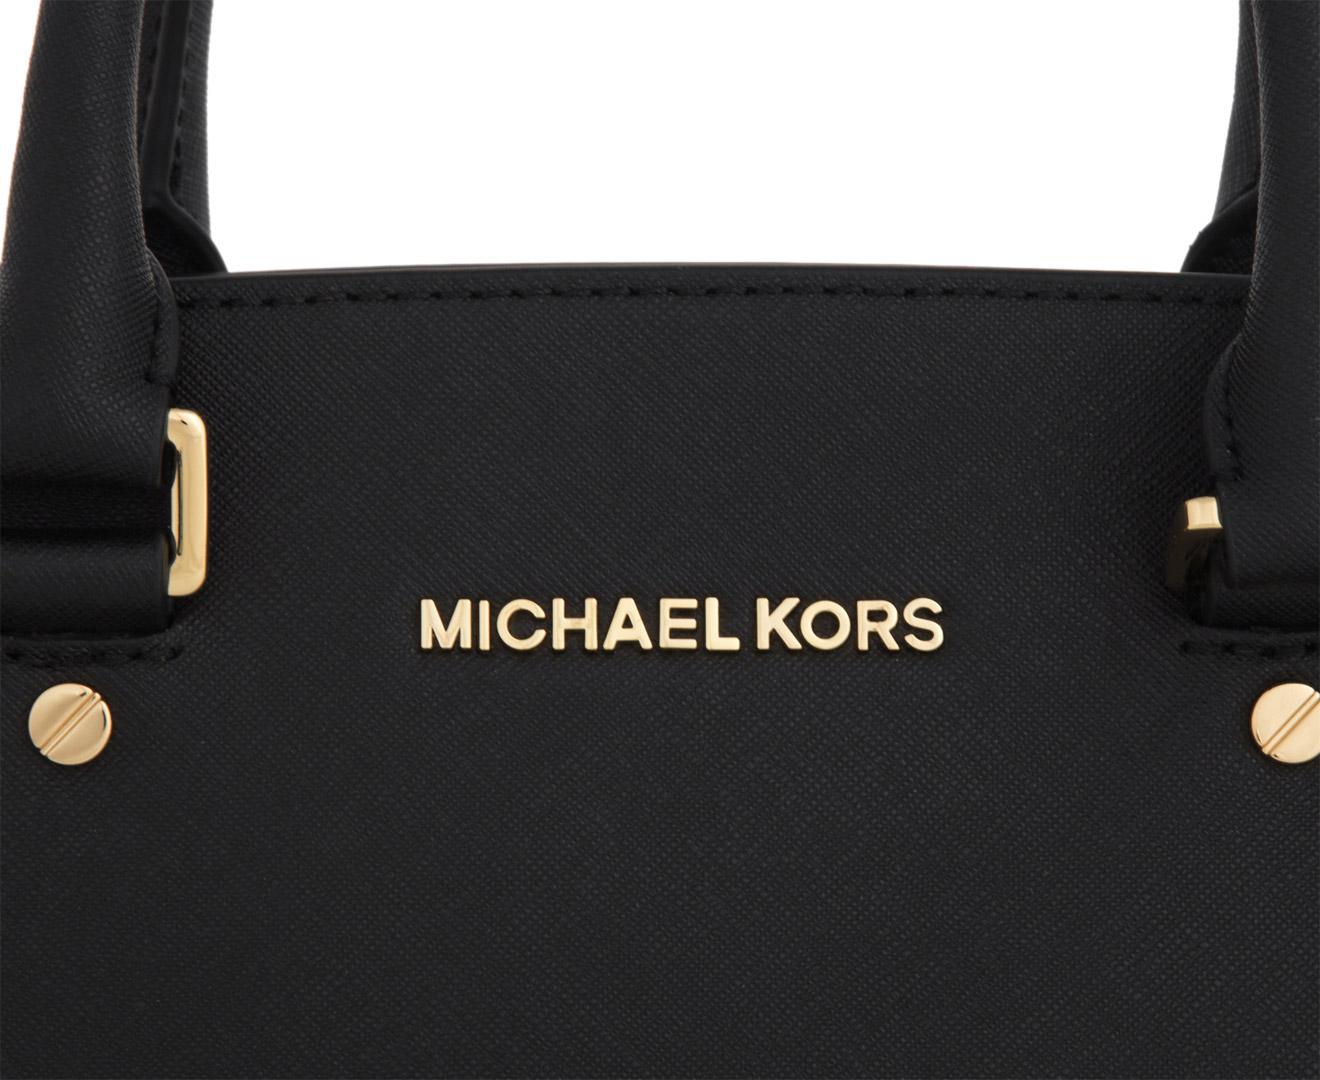 0c9d0e865fd469 Michael Kors Selma Medium Saffiano Leather Satchel - Black | Catch.com.au